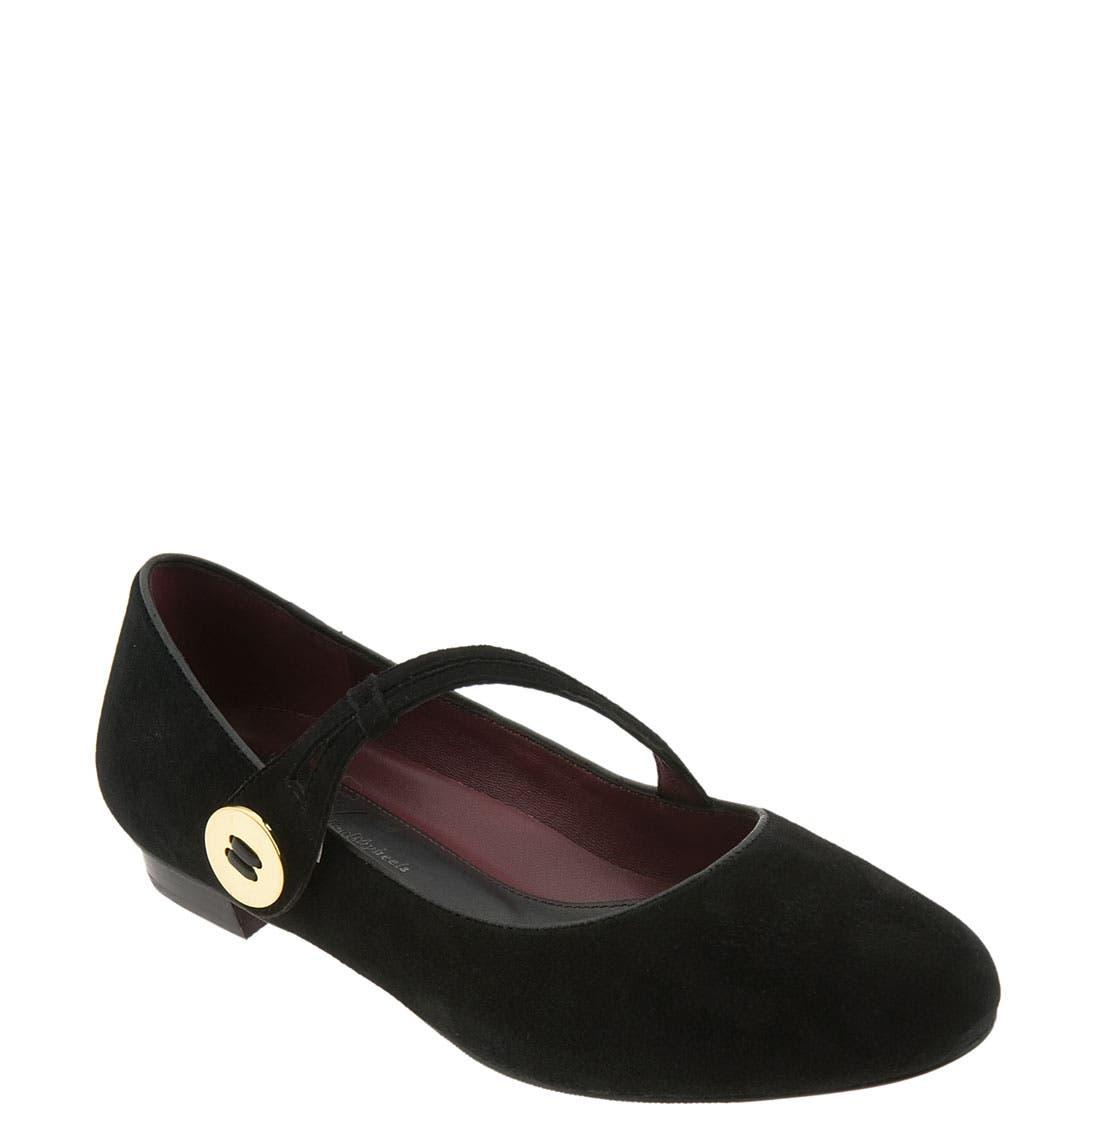 Main Image - Oh! Shoes 'Franka' Mary Jane Flat